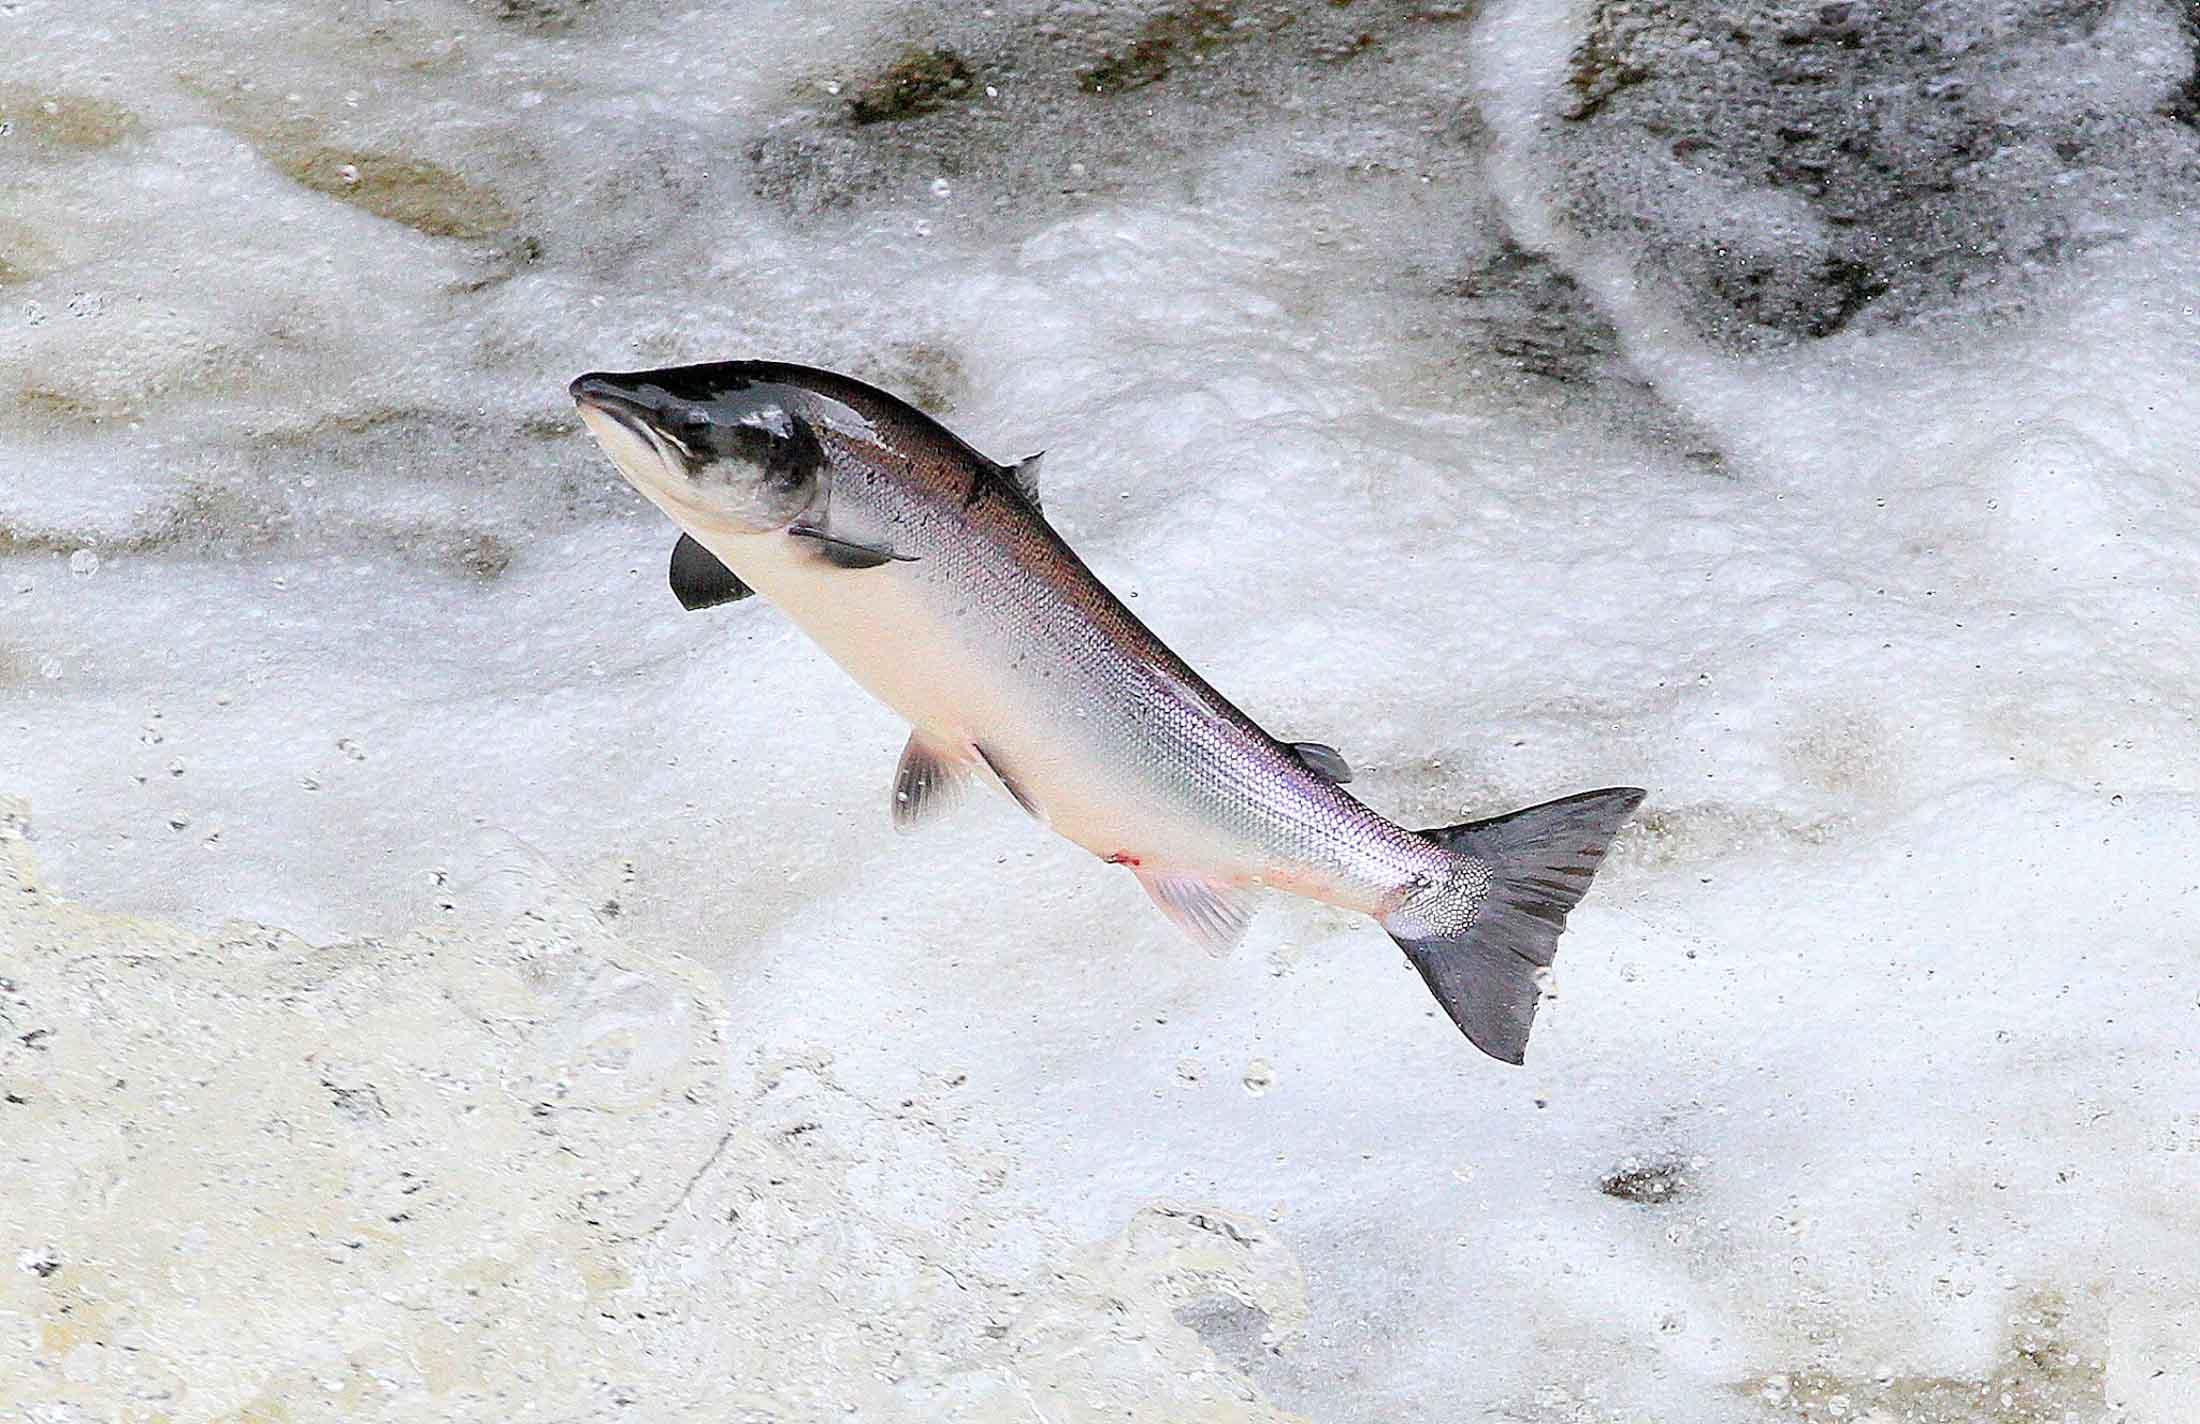 Altlantic Salmon ©Alister Kemp